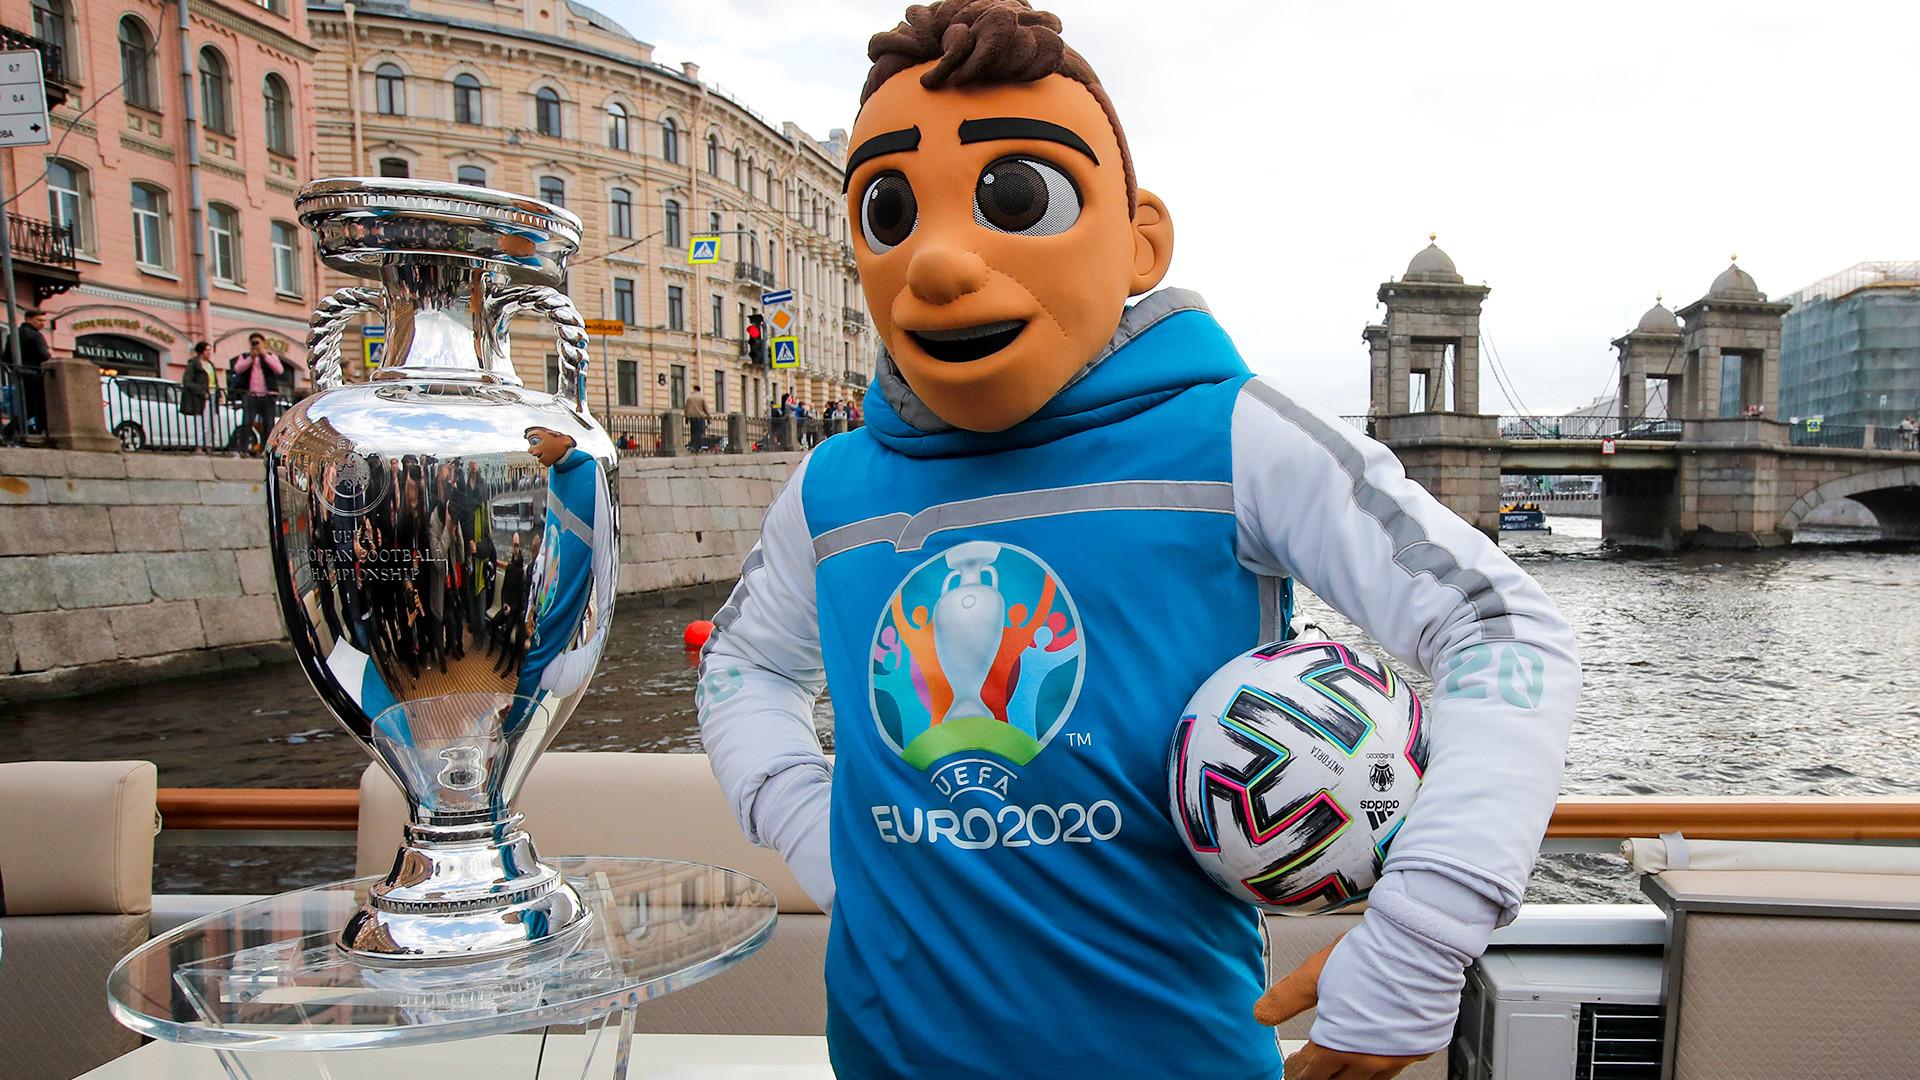 Maskot Kejuaraan Eropa UEFA 2020 Skillzy dan piala EURO 2020 menyusuri Sungai Fontanka selama tur resmi EURO 2020 di Sankt Peterburg, Rusia, Sabtu, 22 Mei 2021. Sankt Peterburg akan menjadi salah satu tuan rumah Piala Eropa 2020 yang tertunda akibat pandemi COVID-19.